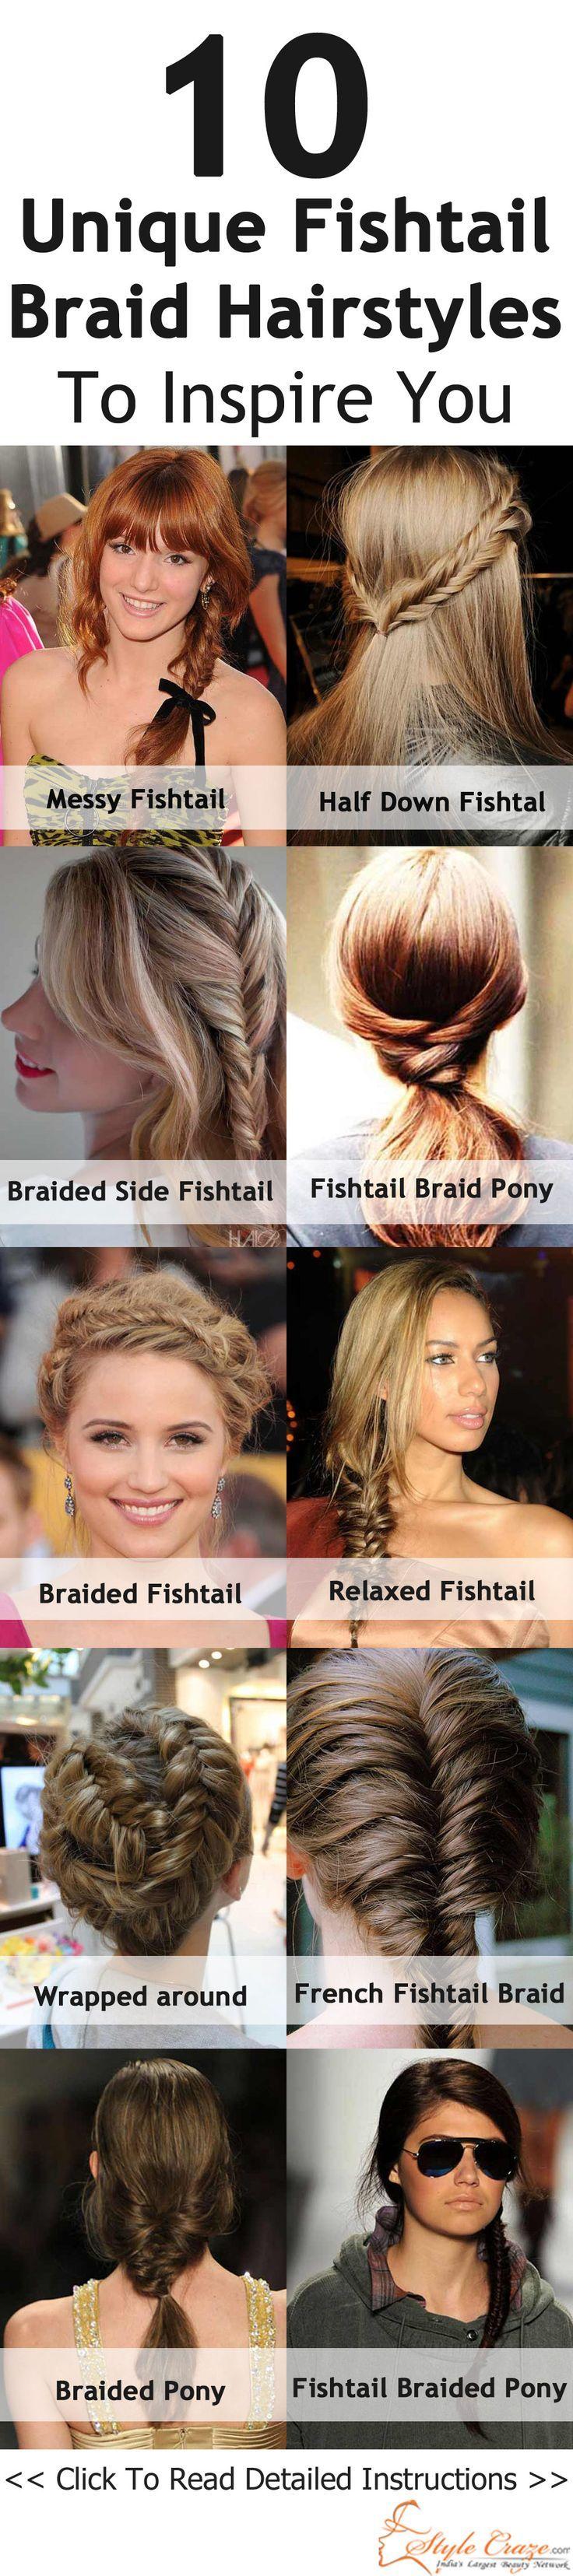 best hair beauty images on pinterest